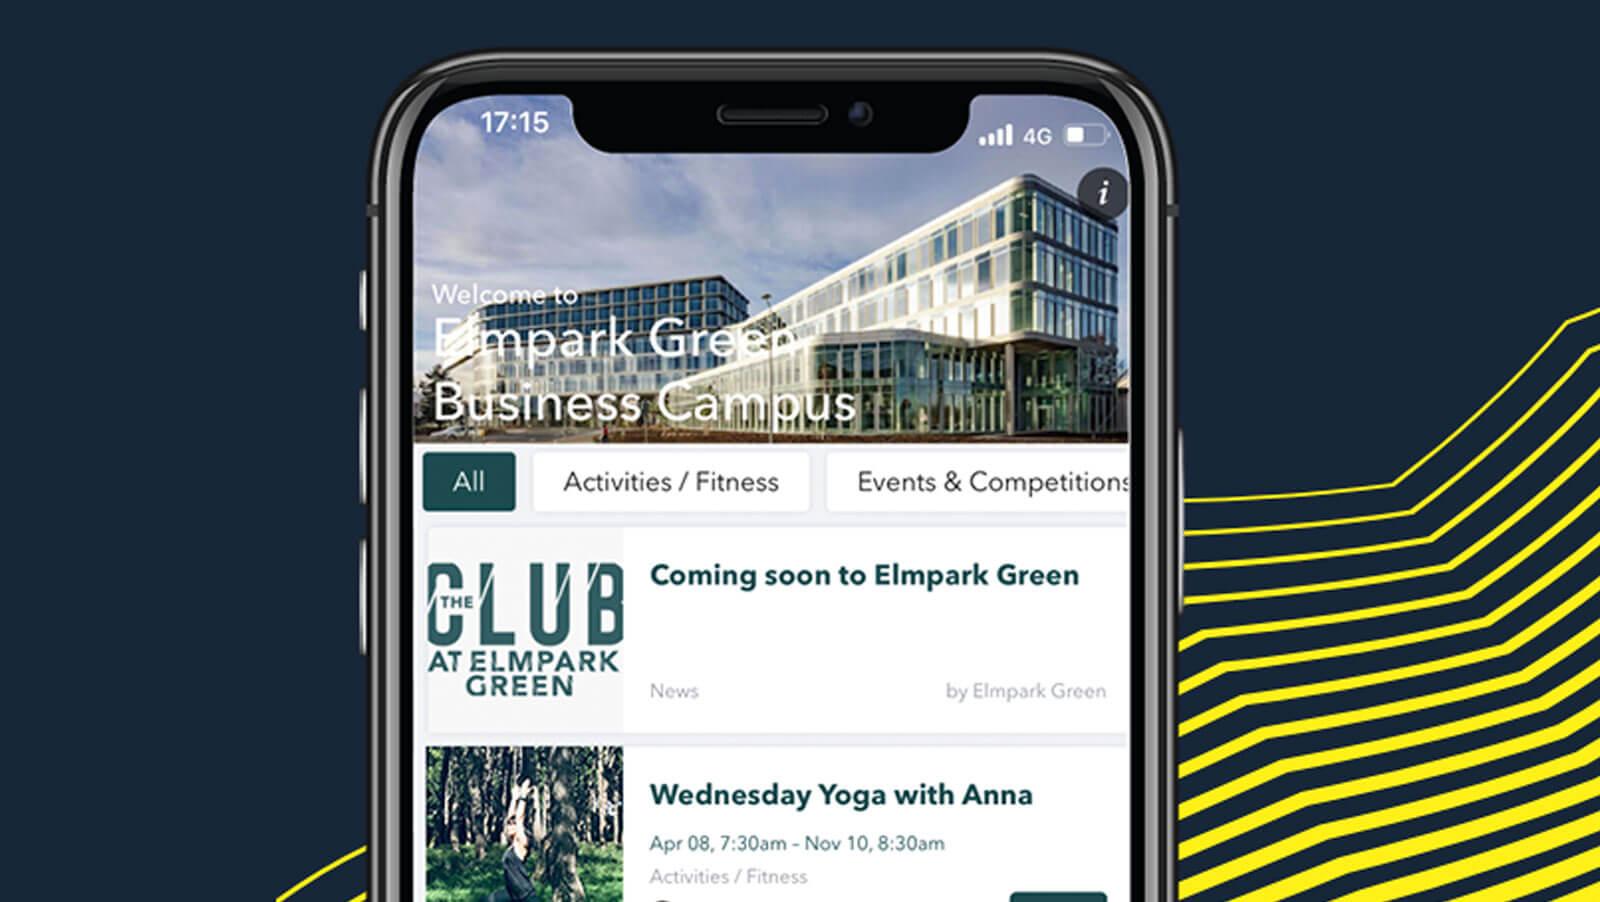 The Seamark Building Dublin Elmpark Green The Club App Screenshot